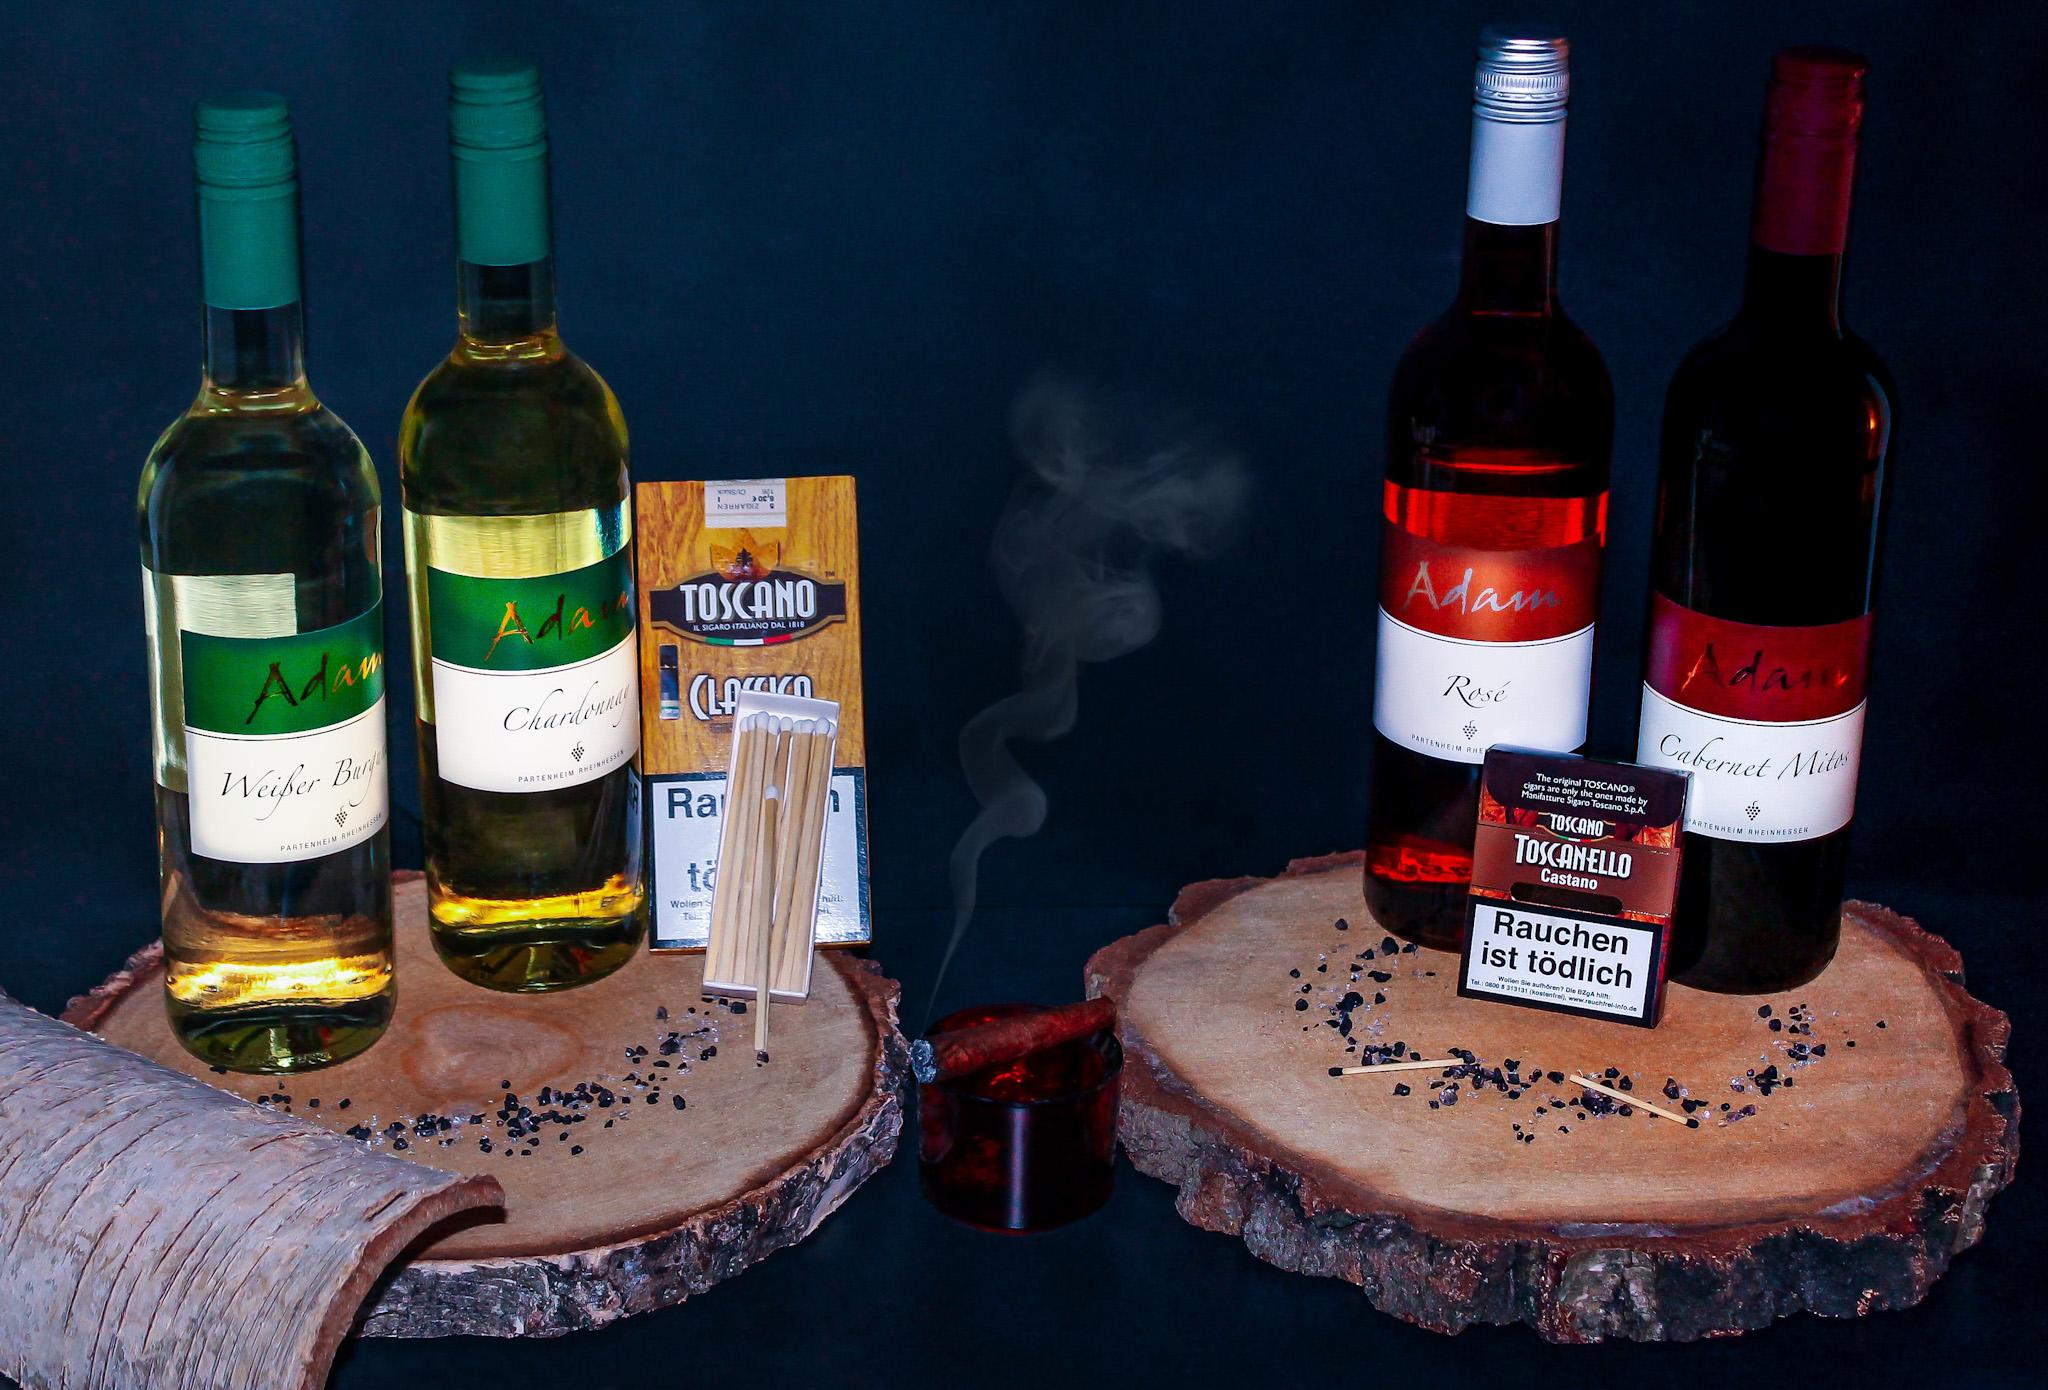 Zigarren Newsletter Weingut Adam